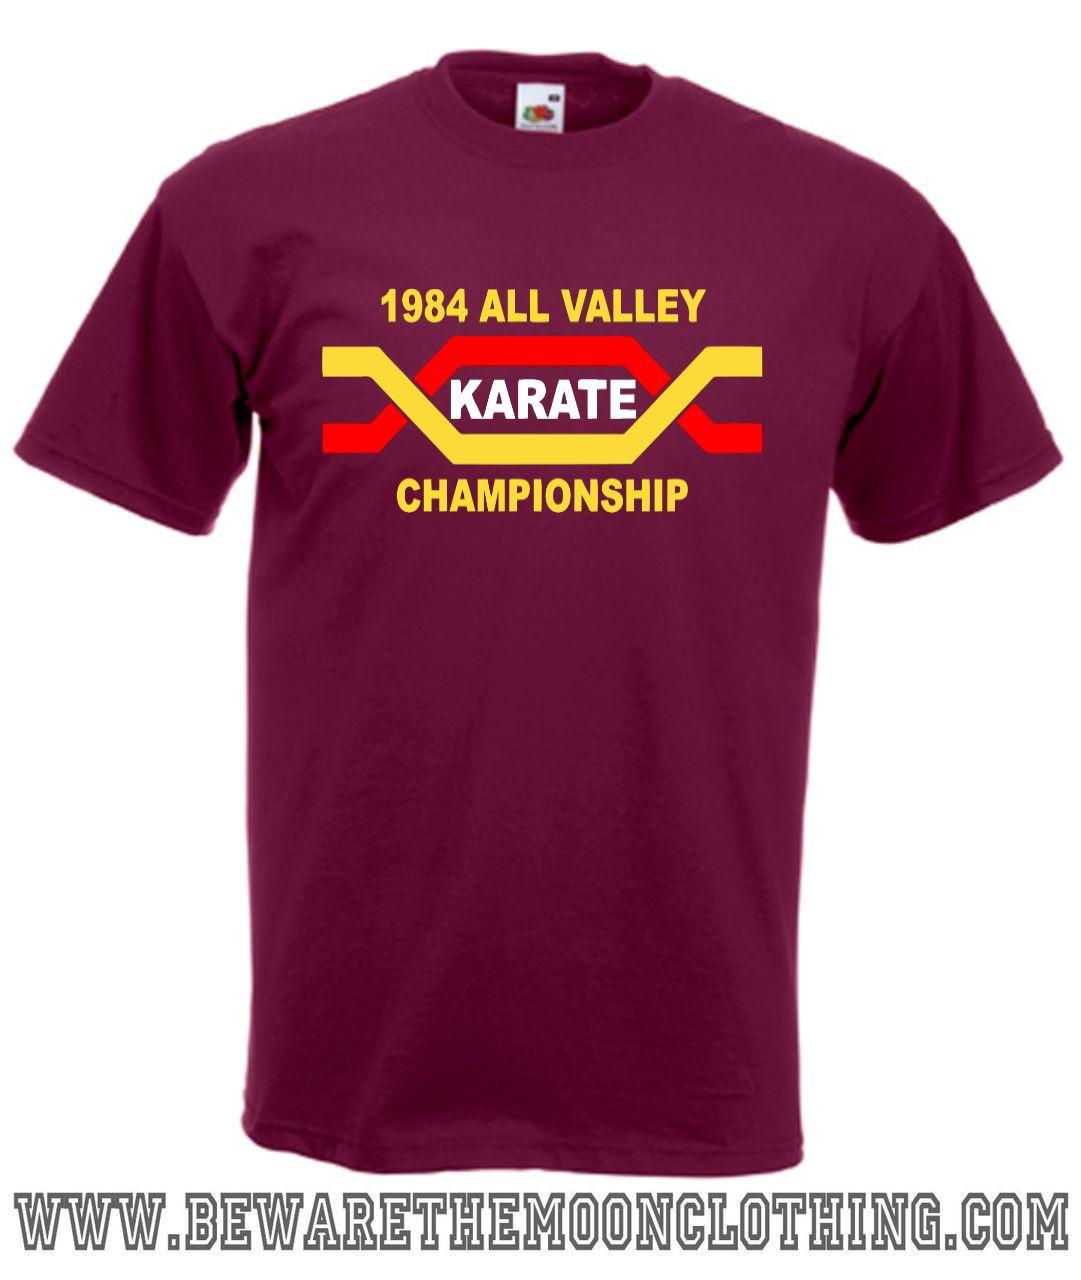 0a0058c68 Karate Kid All Valley Karate Championship Retro Movie T Shirt mens burgundy